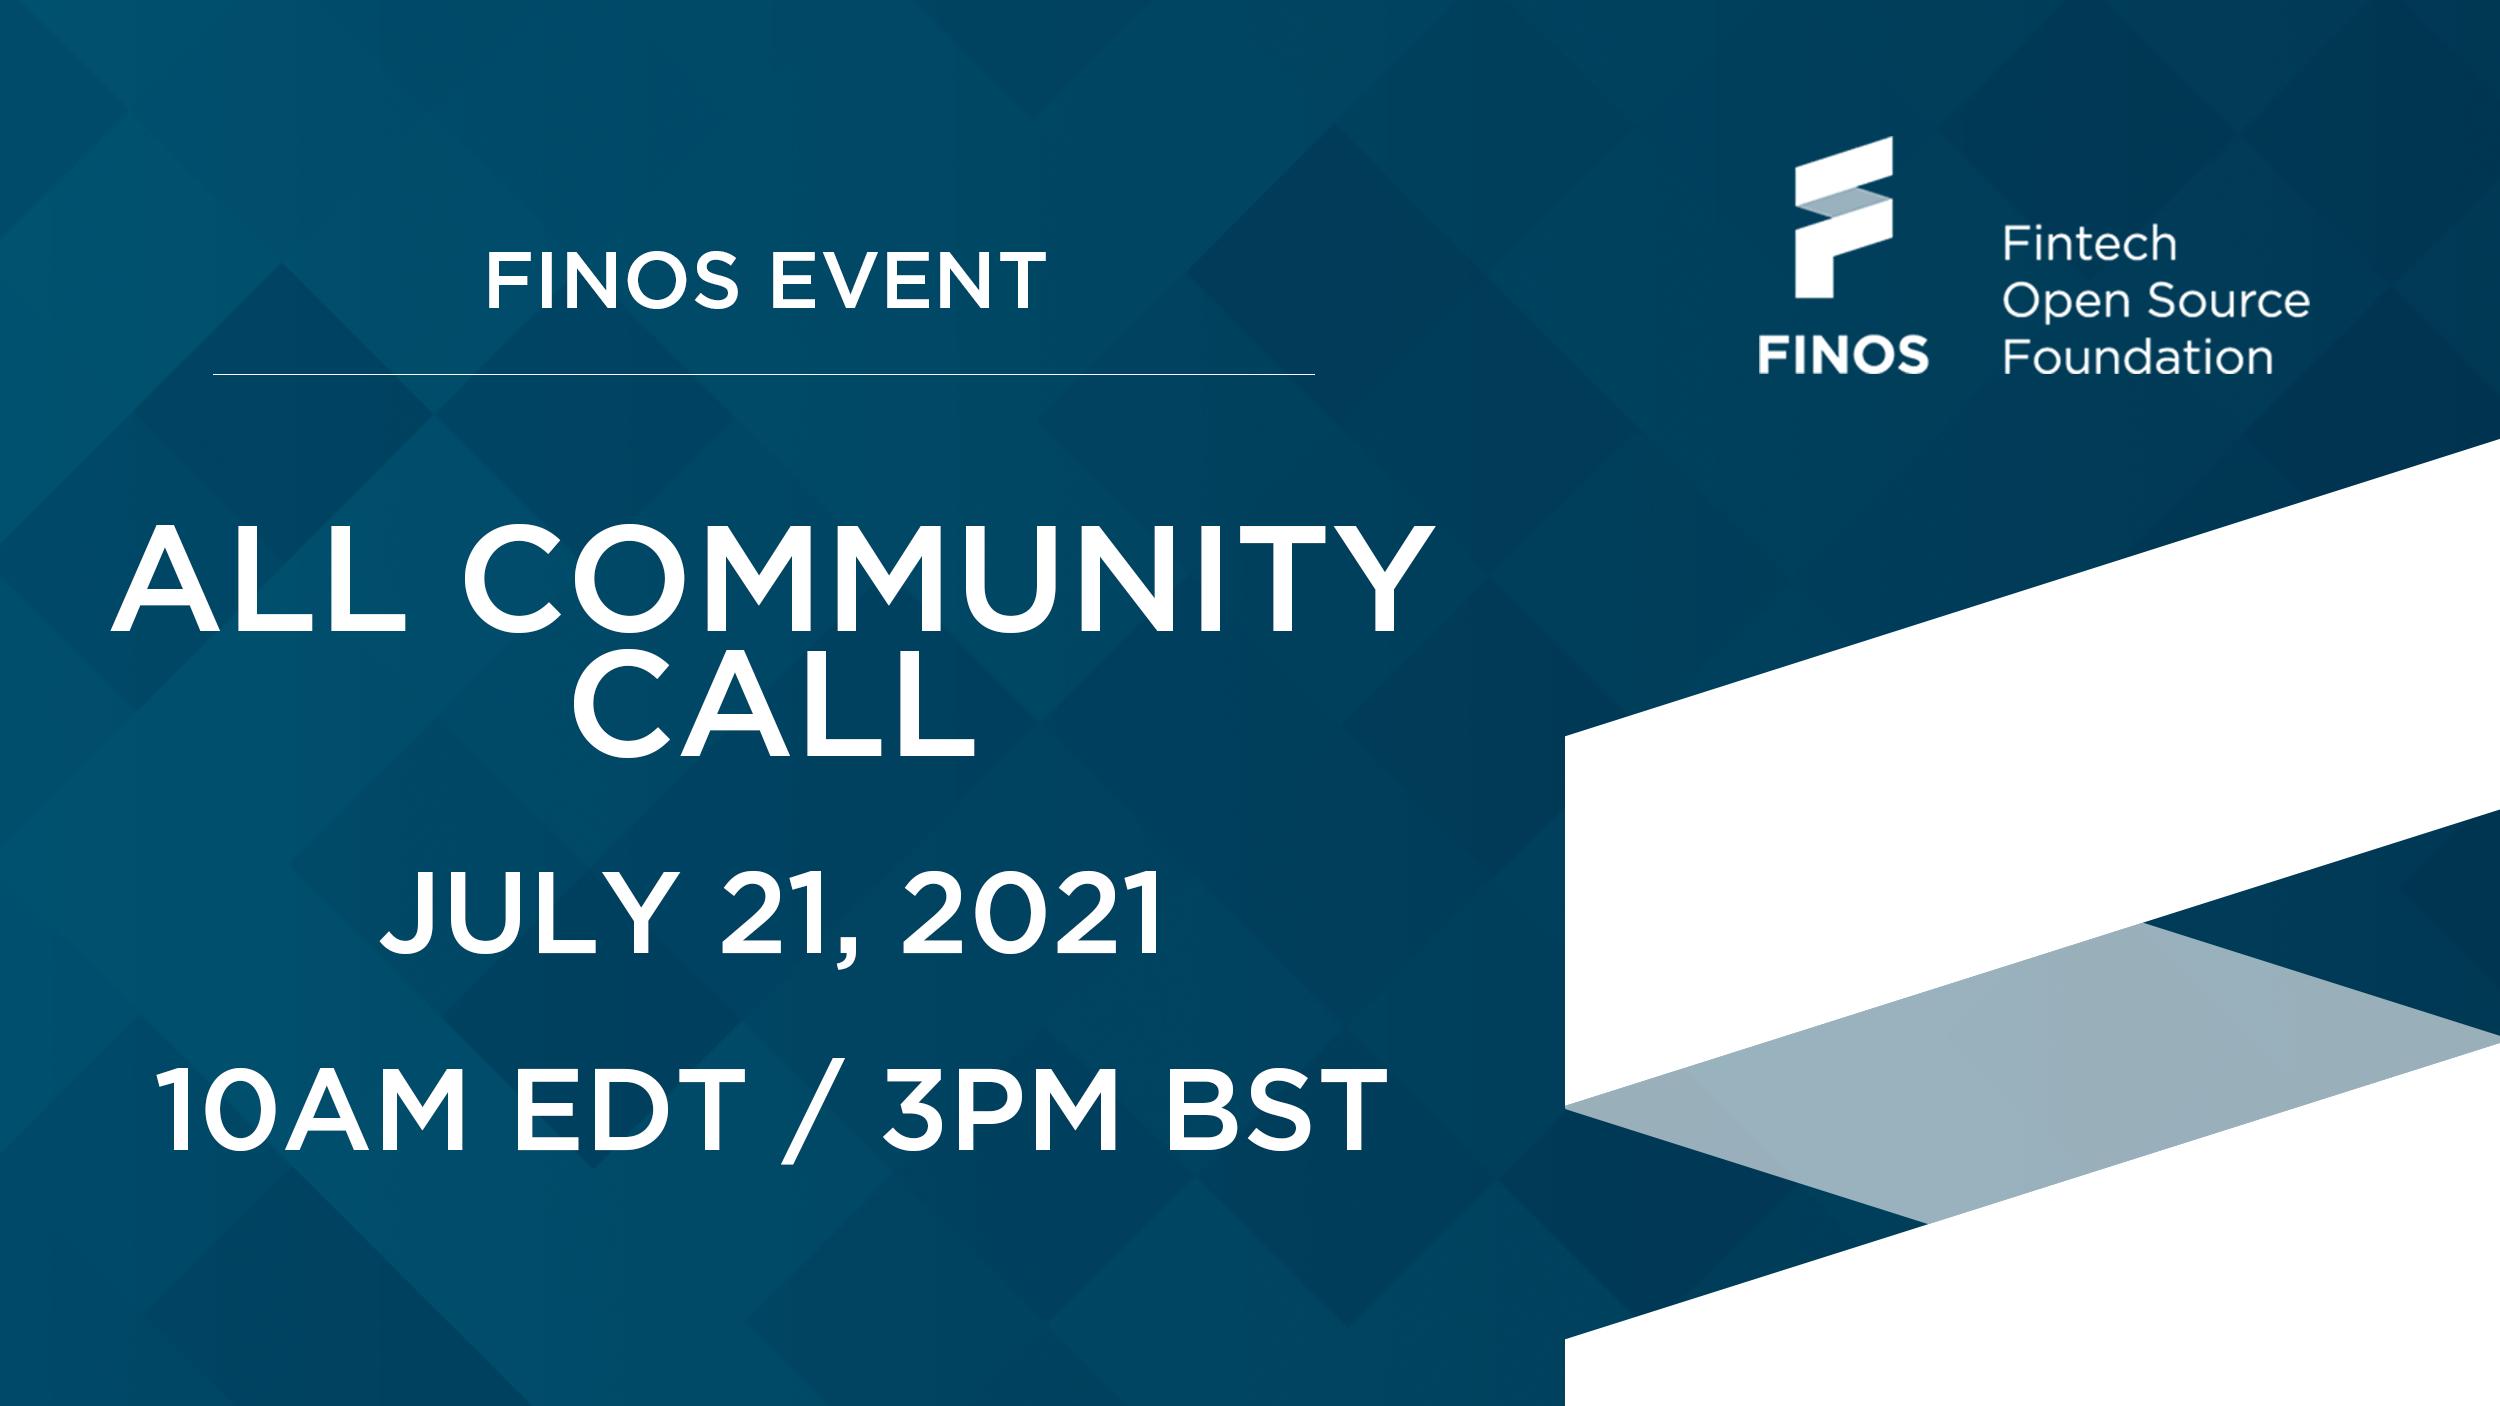 all-community-call-july-21